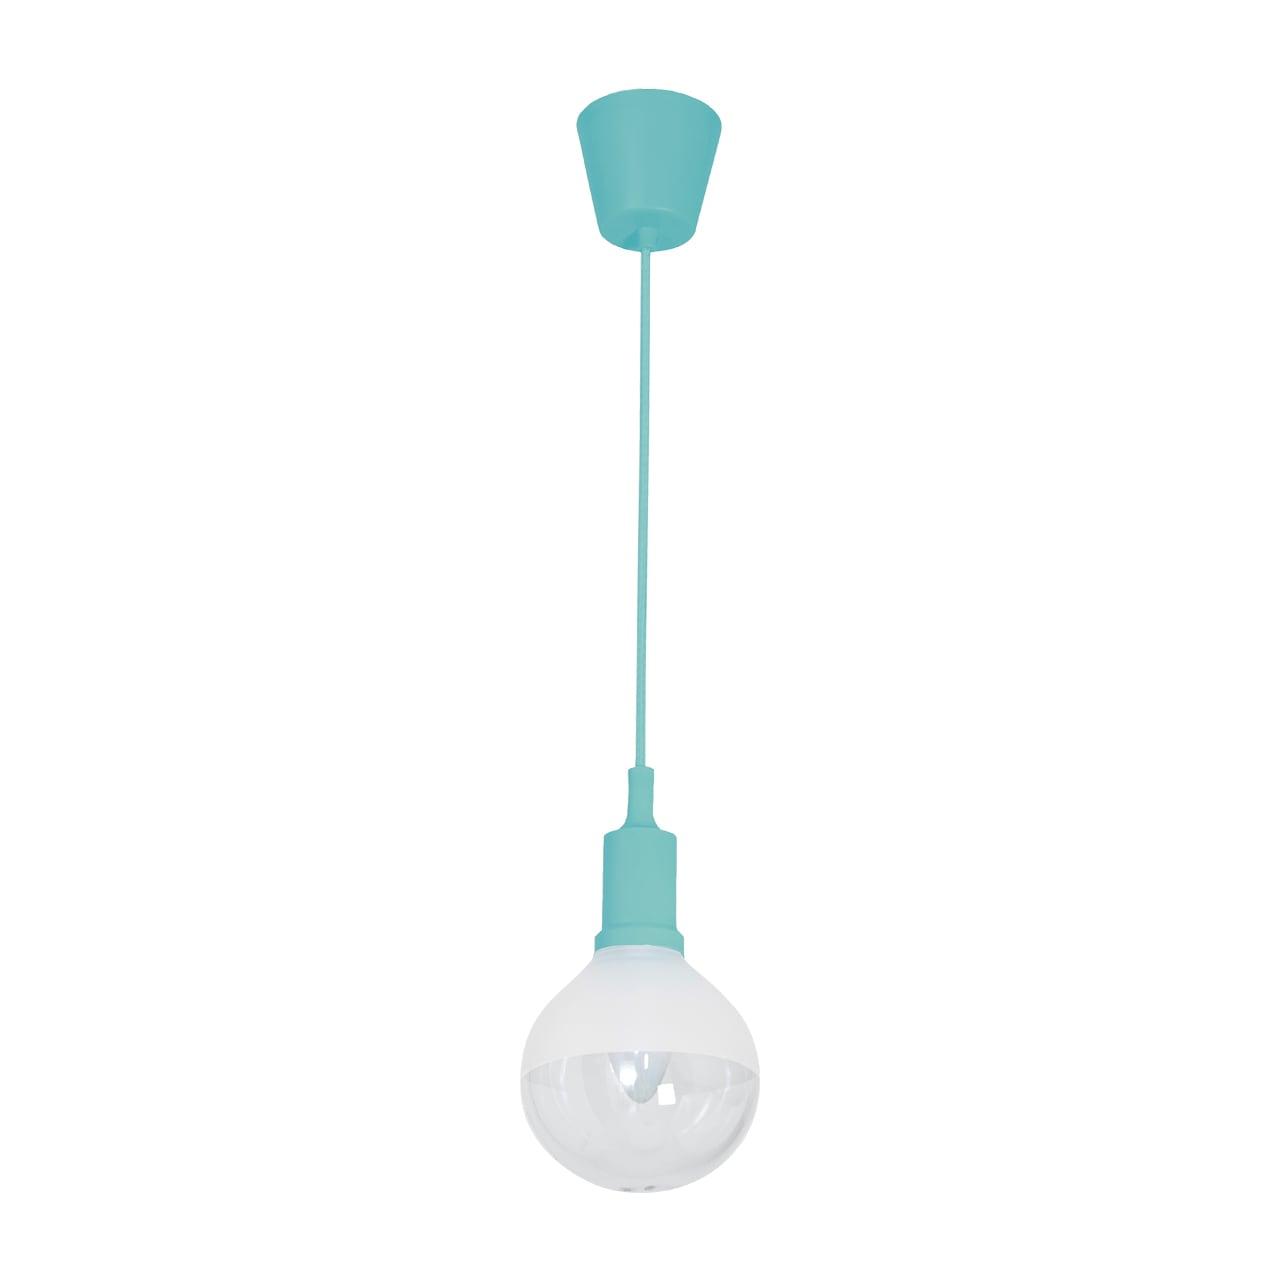 Lampa suspendată Milagro BUBBLE TURQUOISE 459 Turquoise 5W